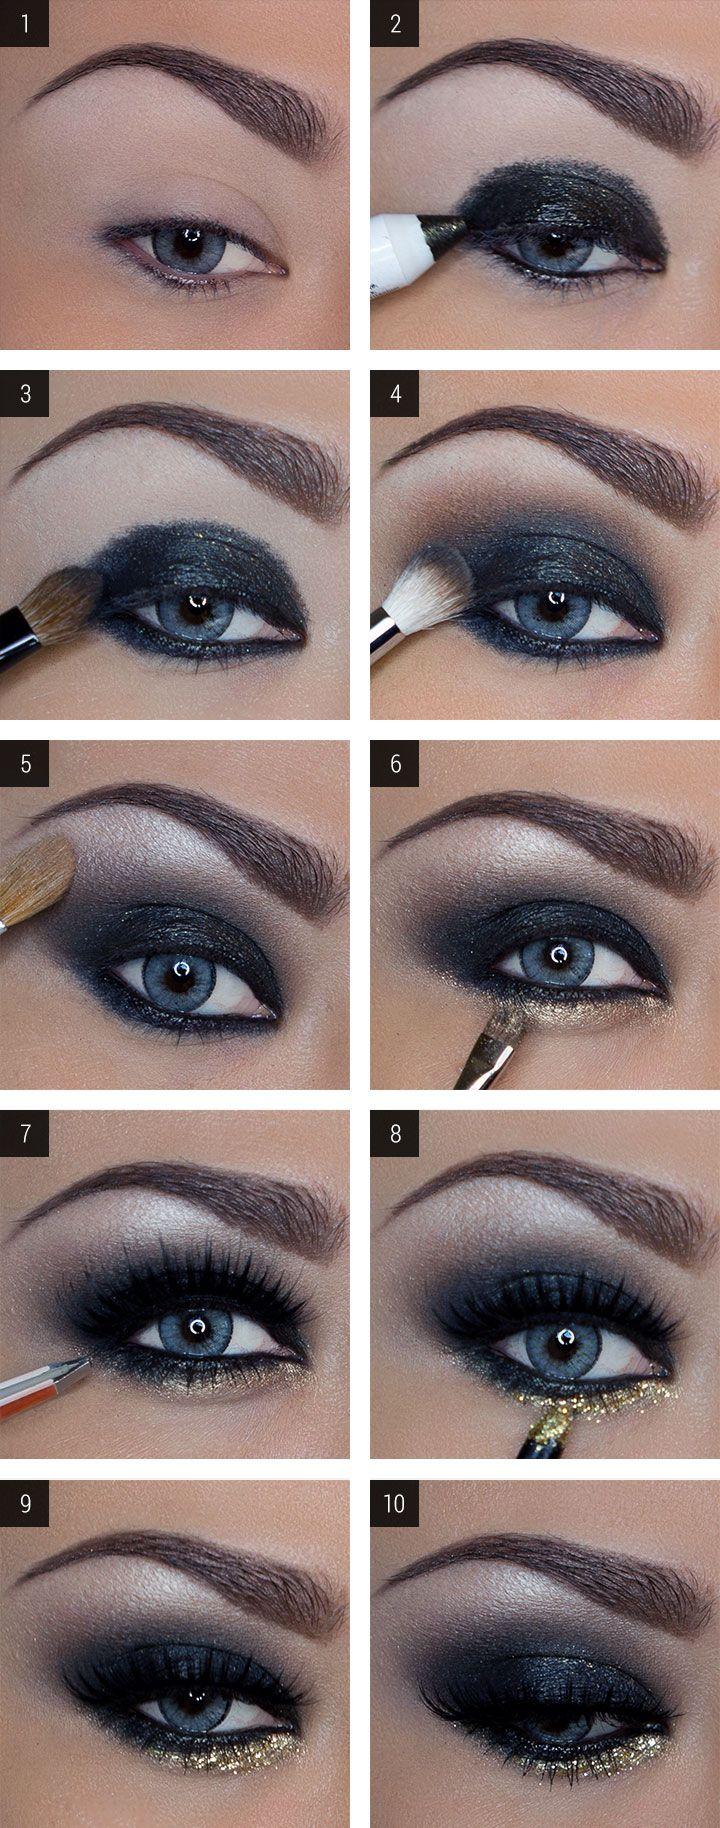 Faddish Glitter Somky Eye Makeup Tutorial for New Year's Eve